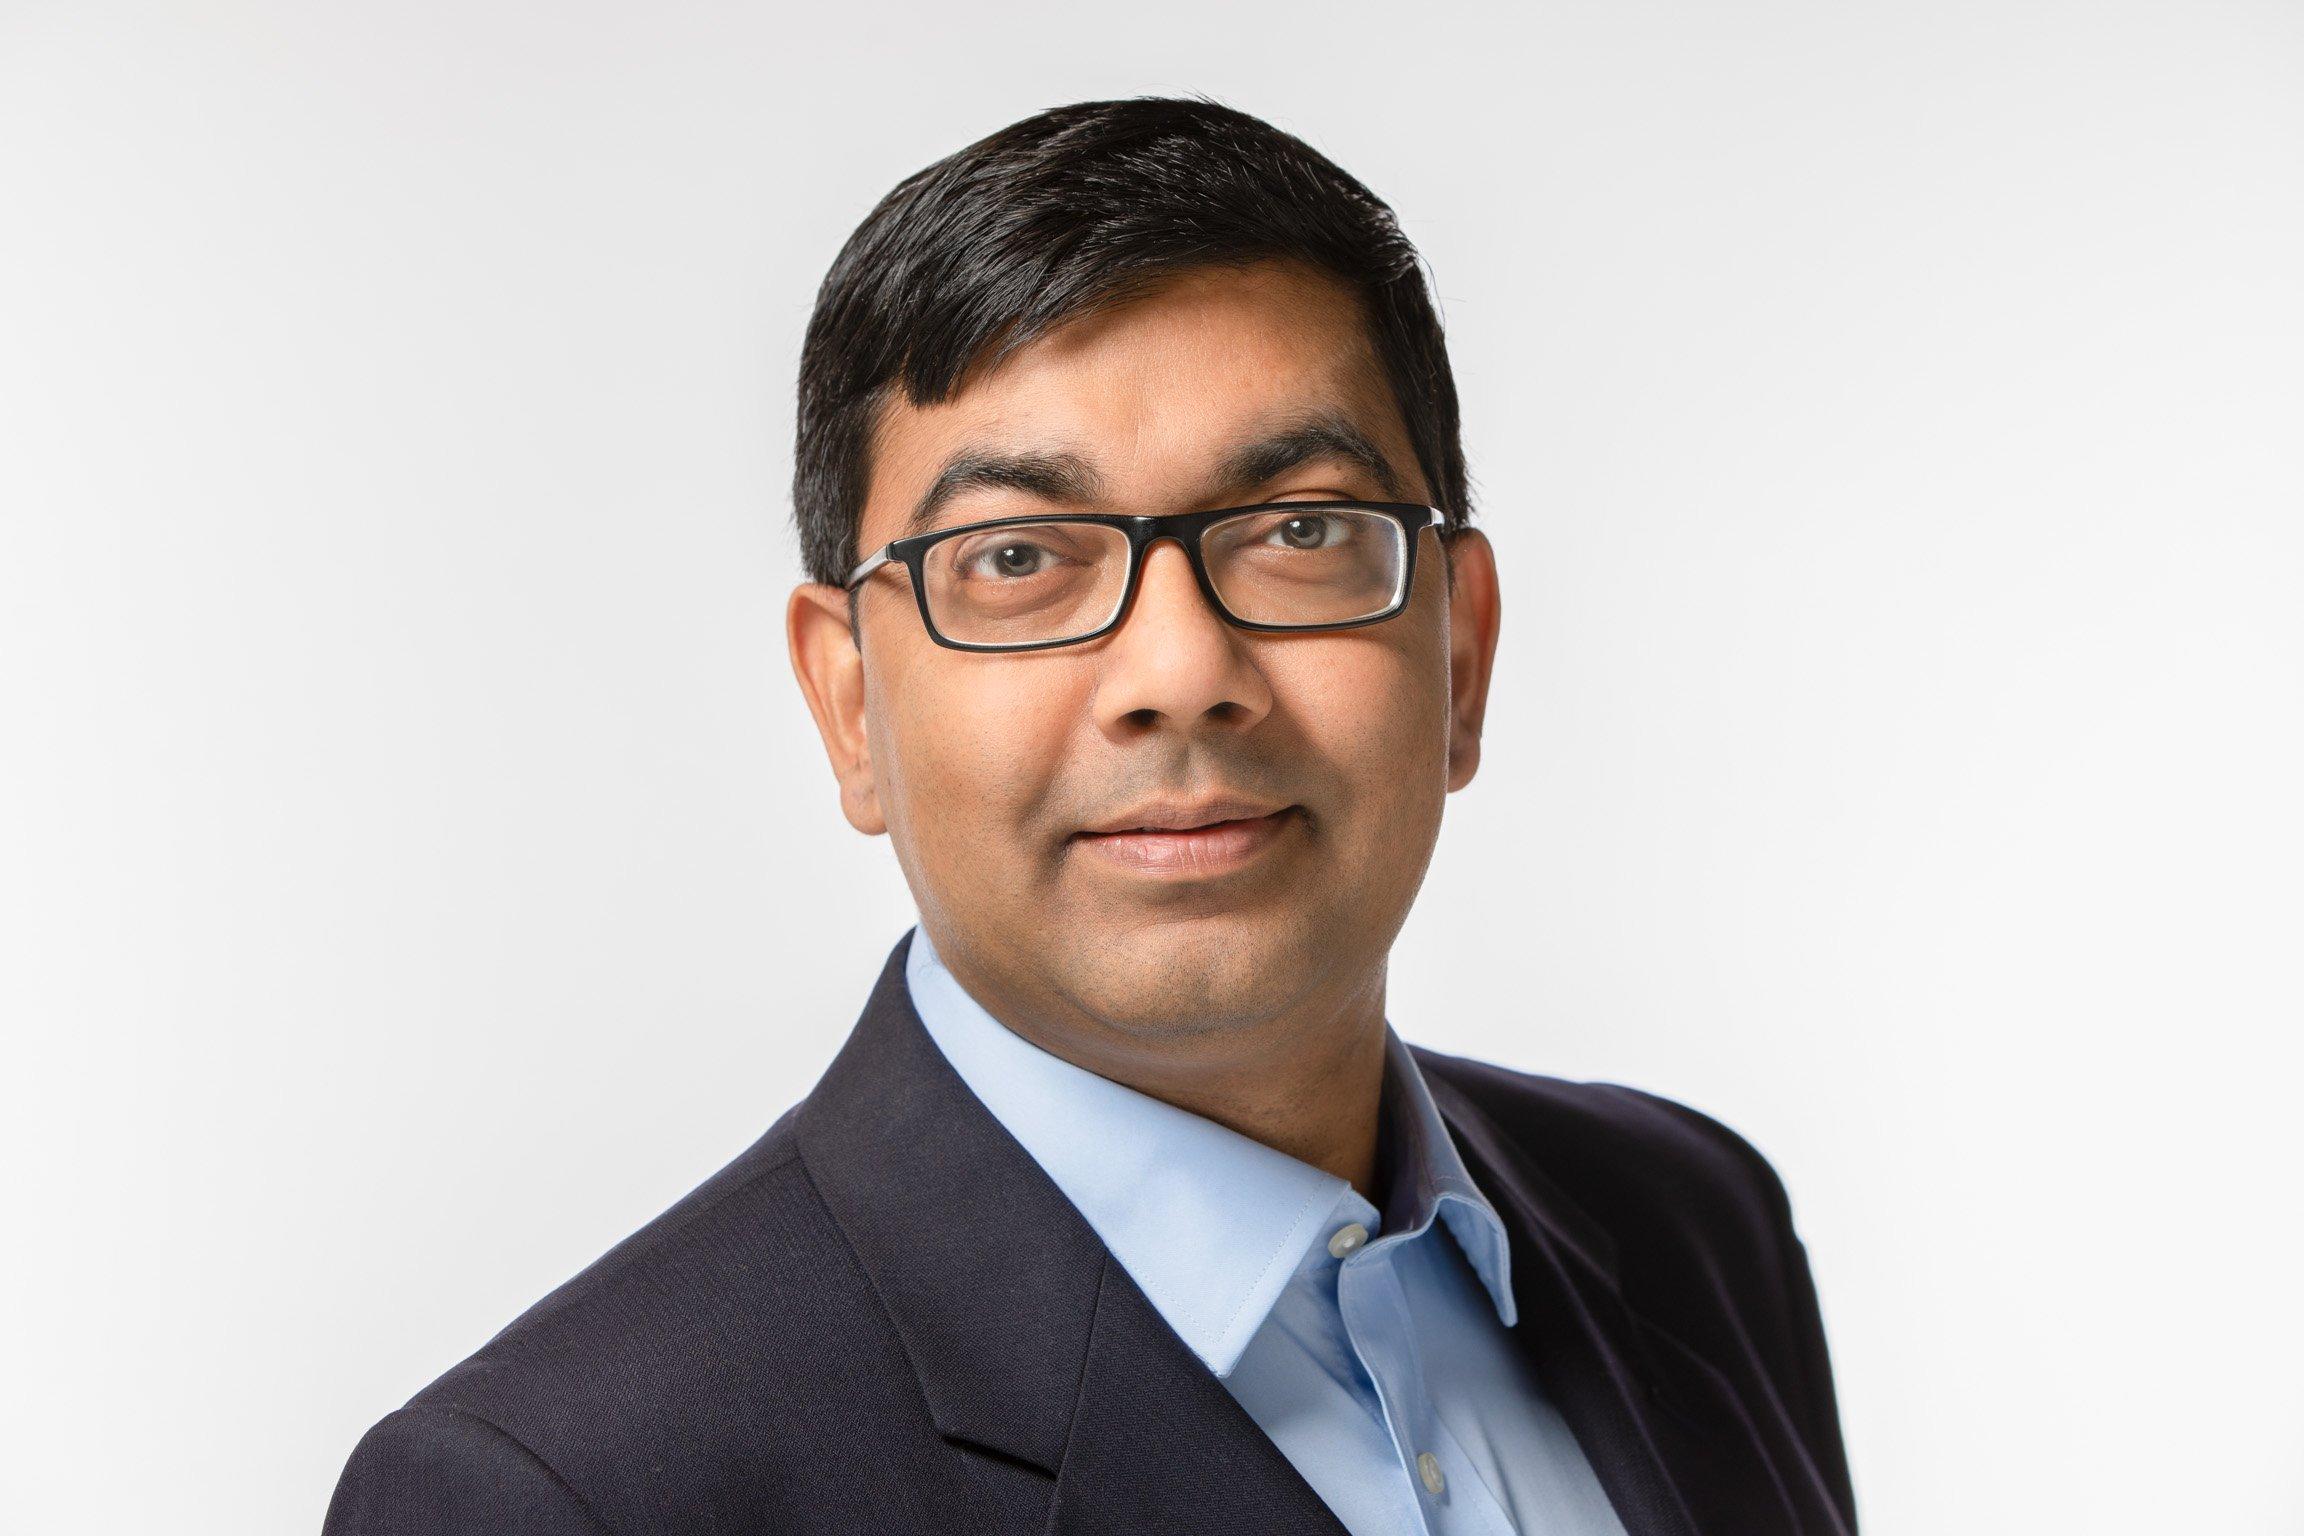 Soumendu Bhattacharya - Web Ready